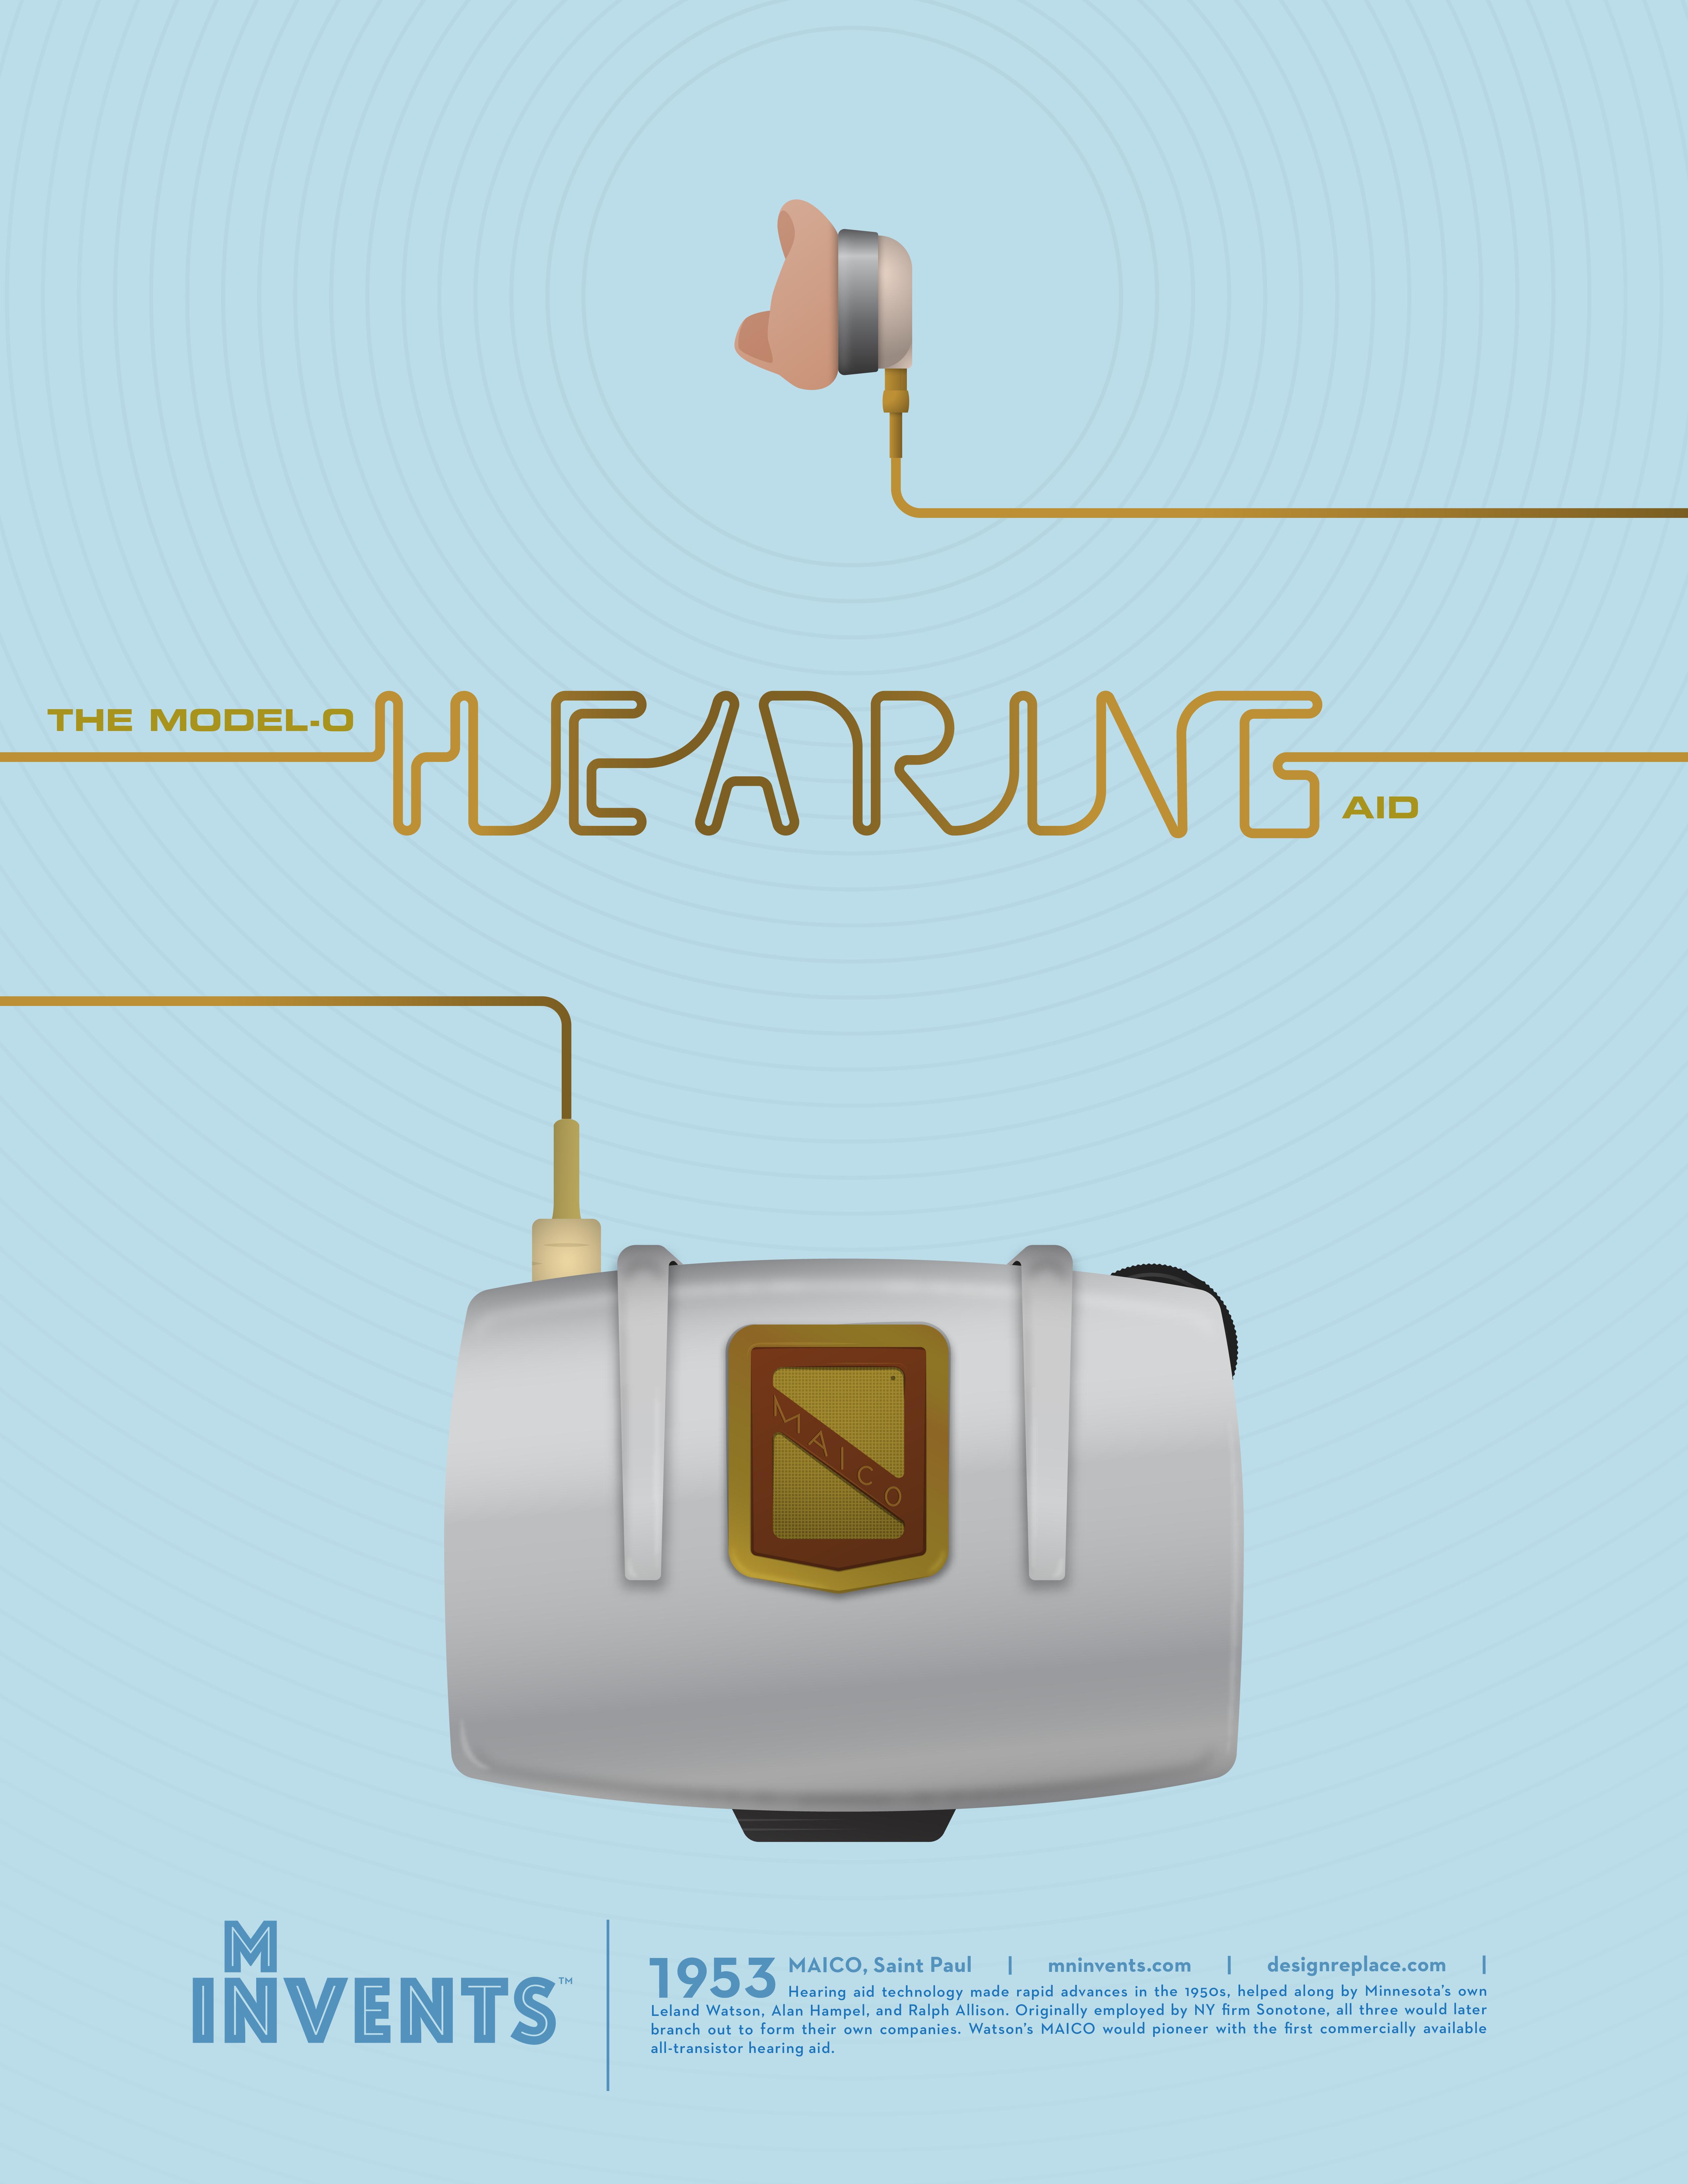 Transist-Ear Hearing Aid